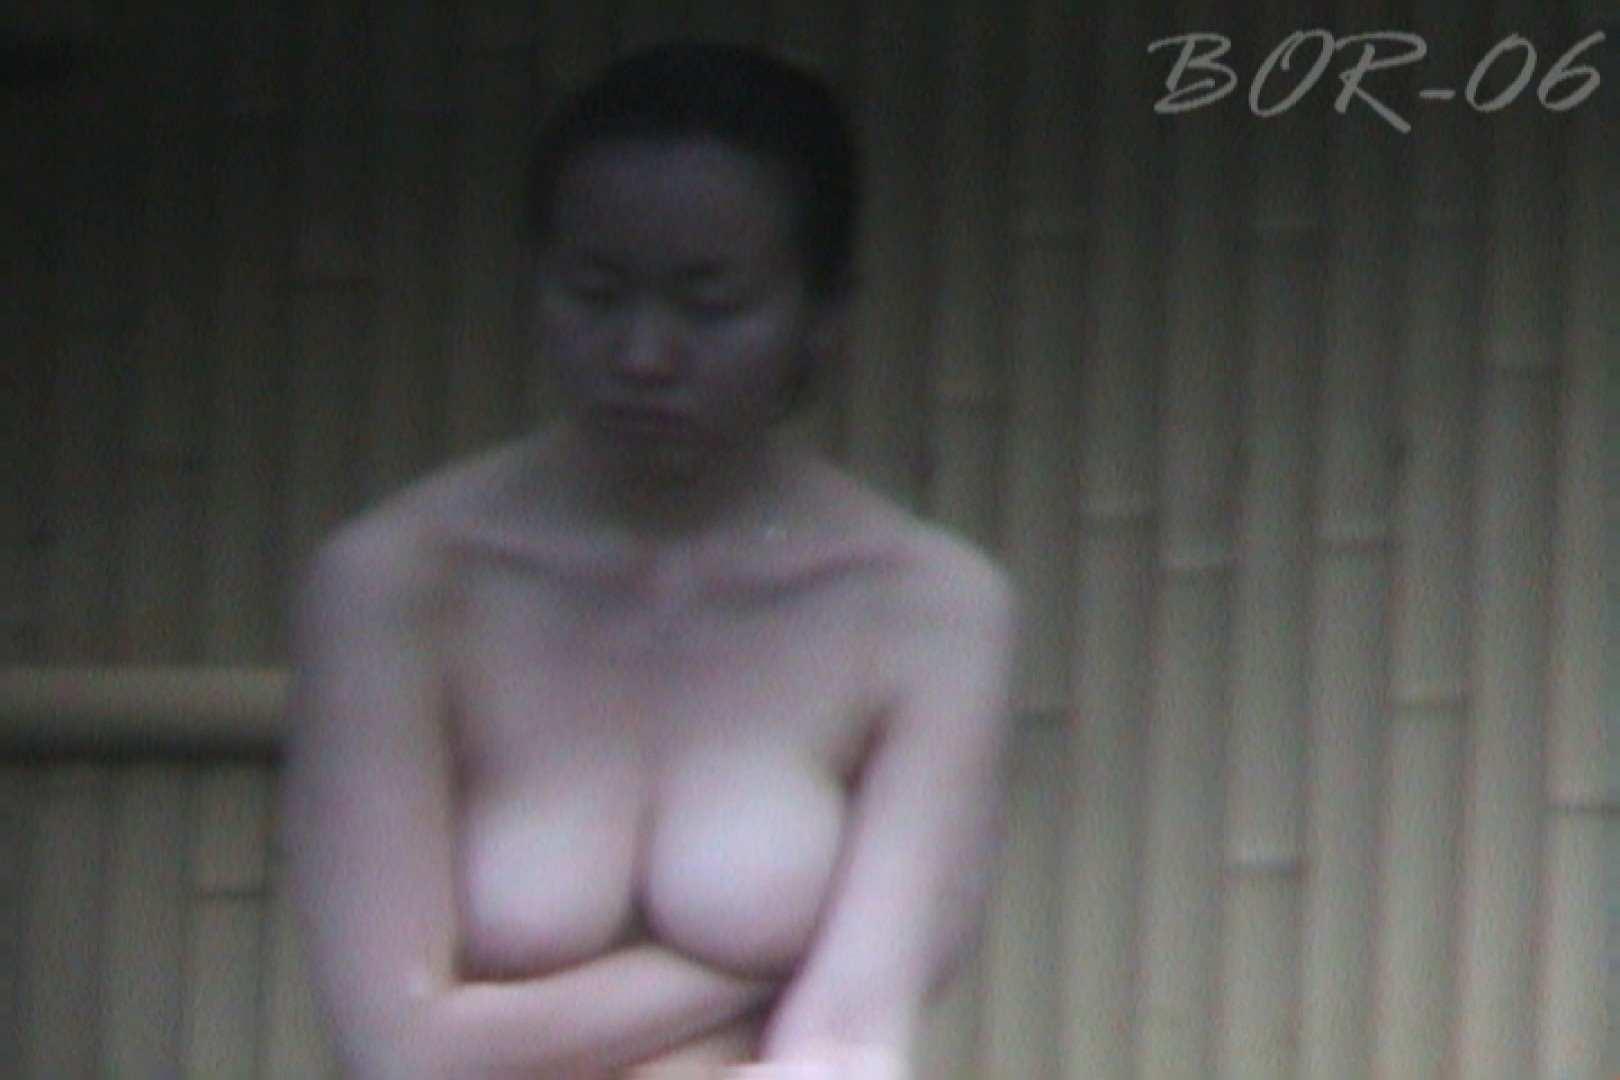 Aquaな露天風呂Vol.519 露天風呂突入 のぞき動画画像 102pic 83